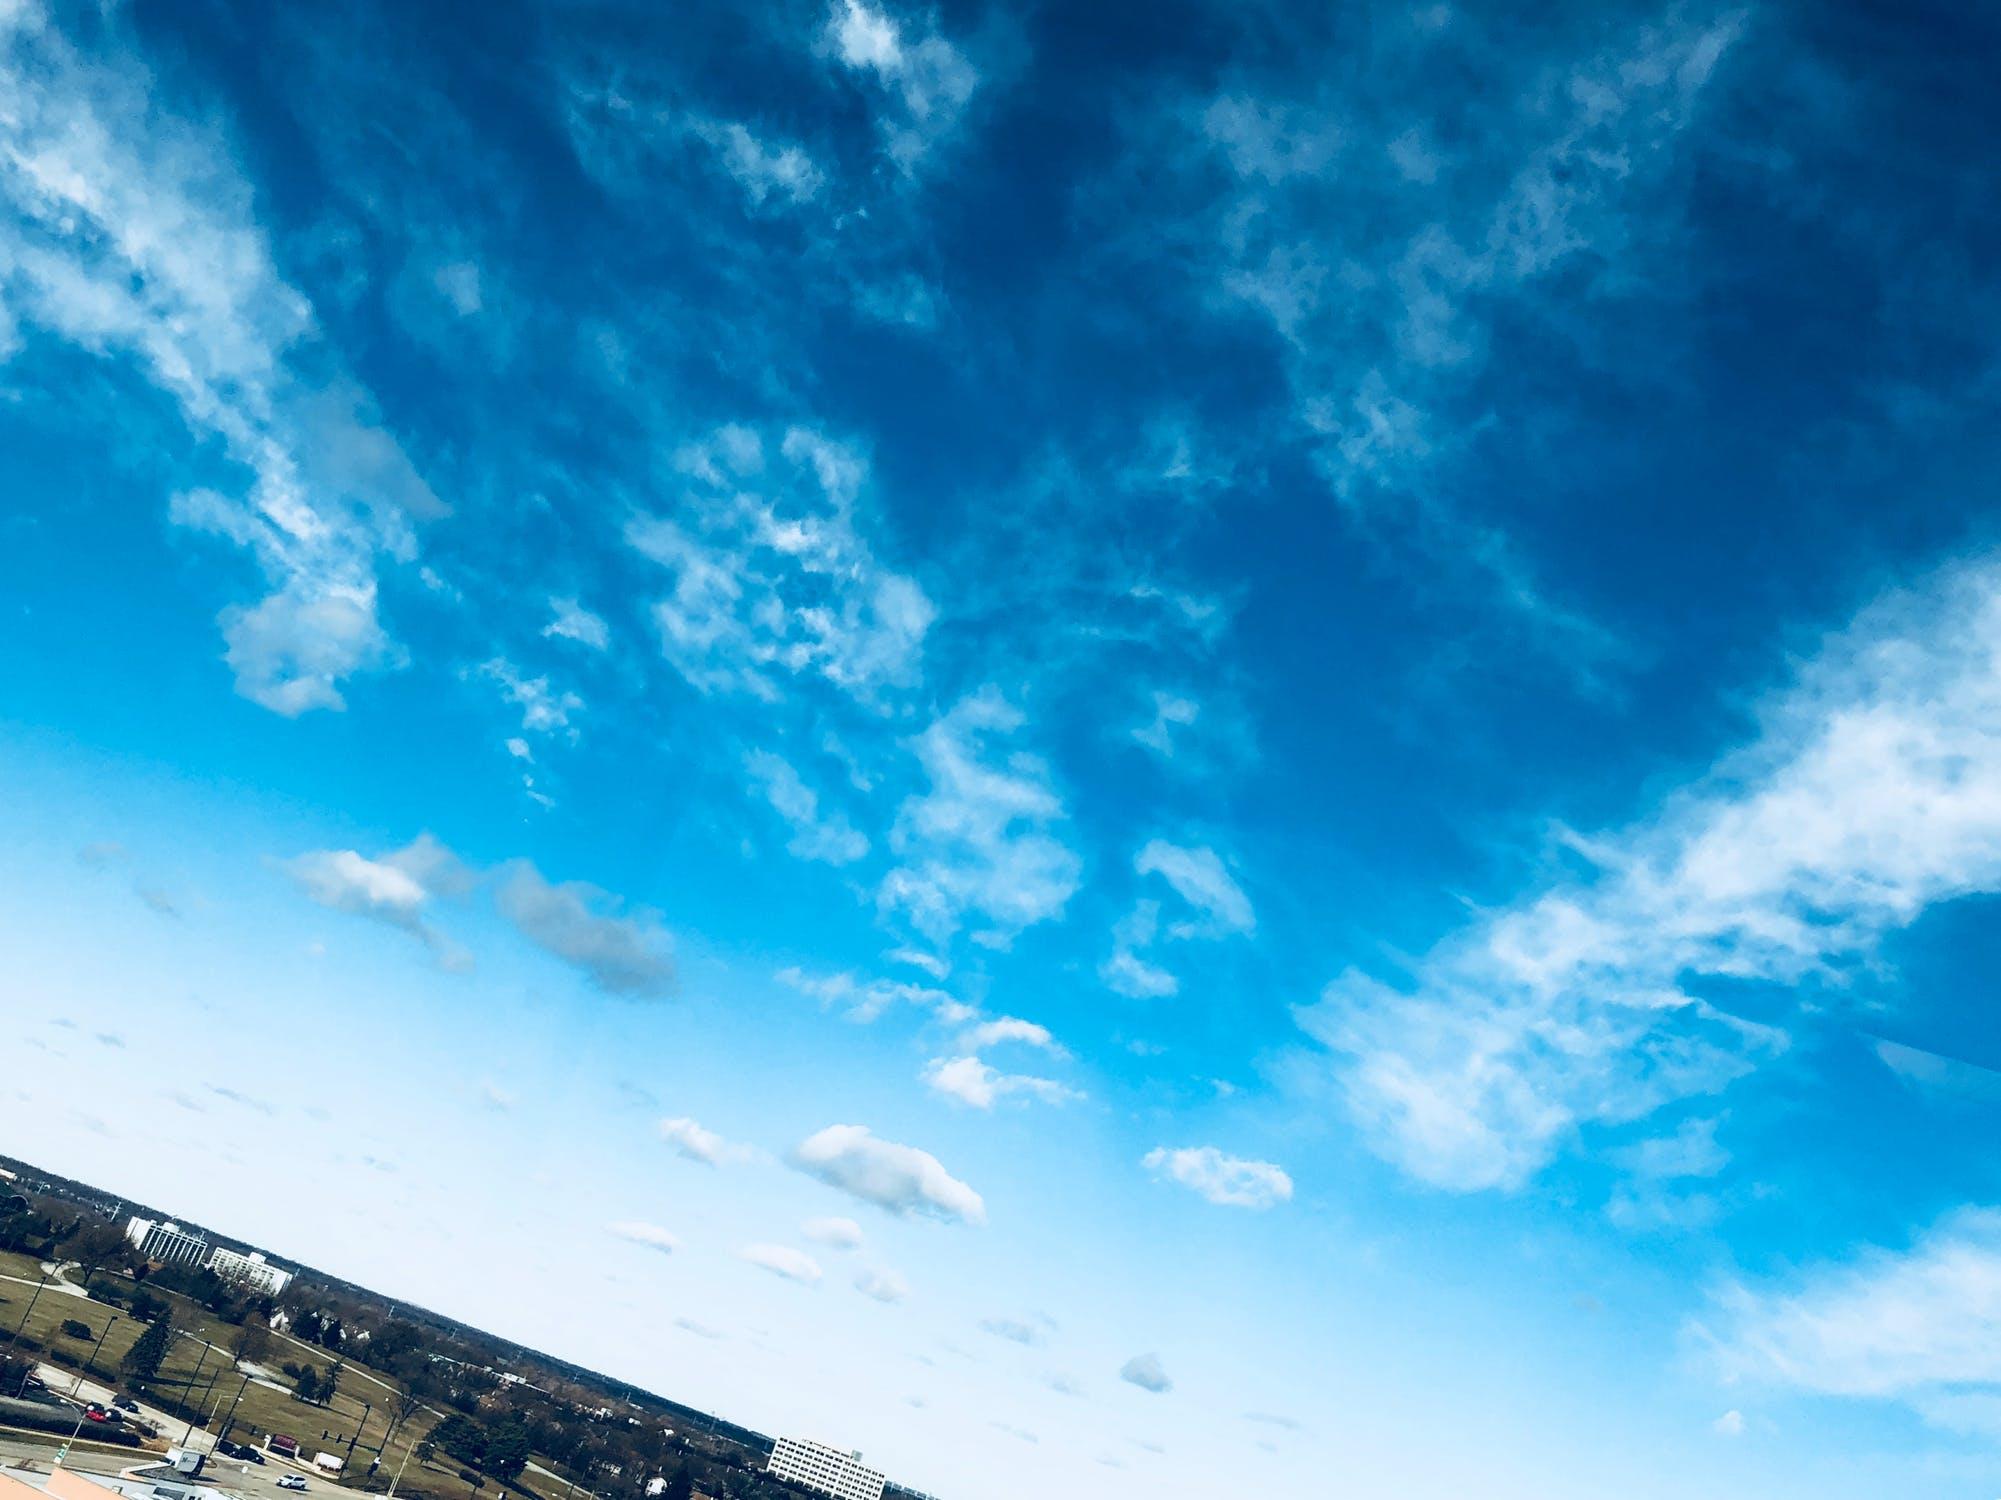 la voiture volante airbus s'empare du ciel